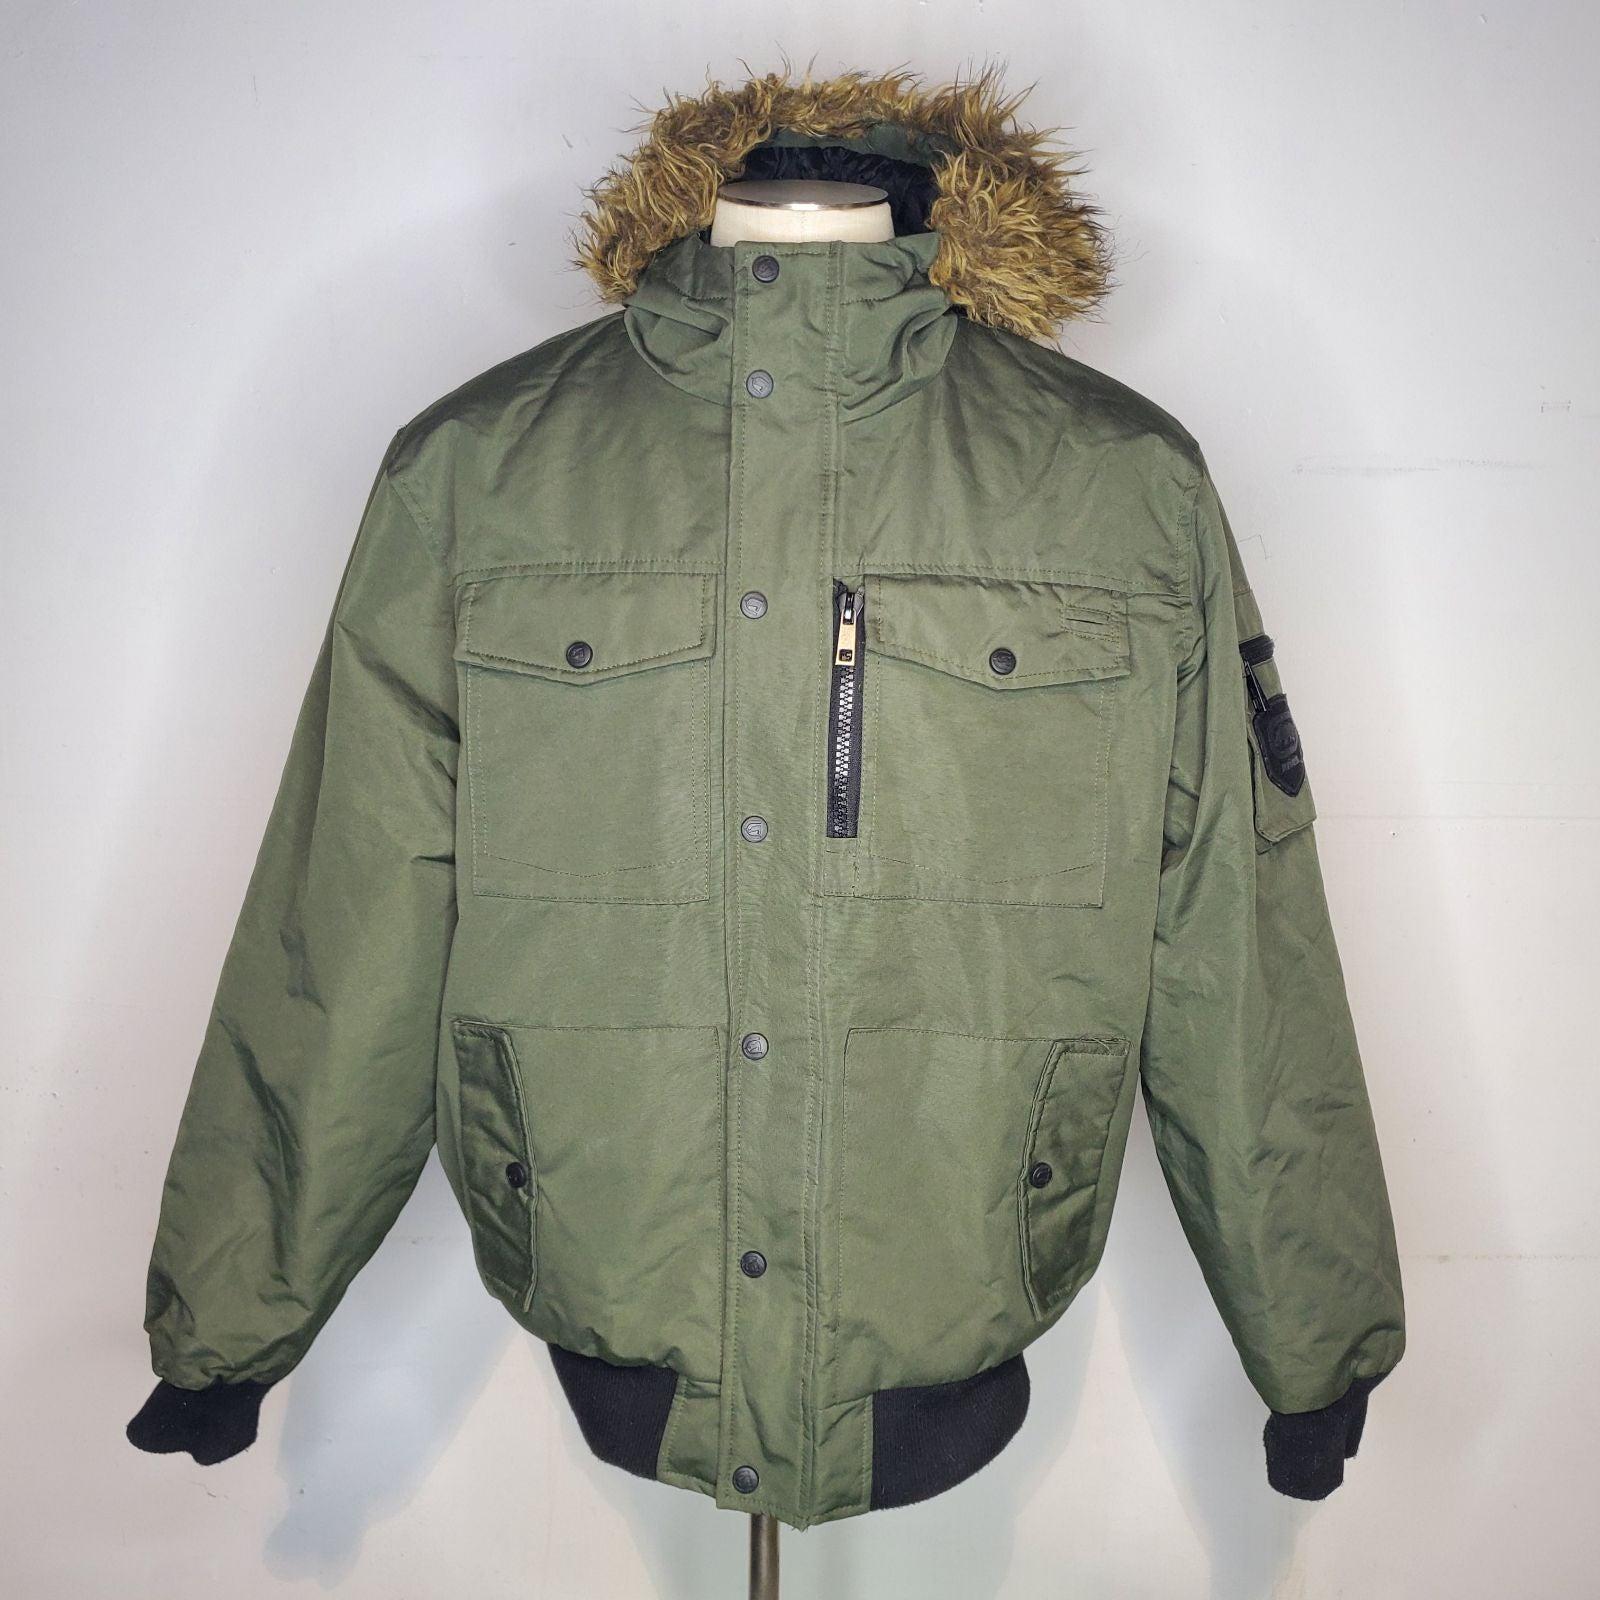 Y2k Ecko Unltd Bomber Jacket Full Zip Fa